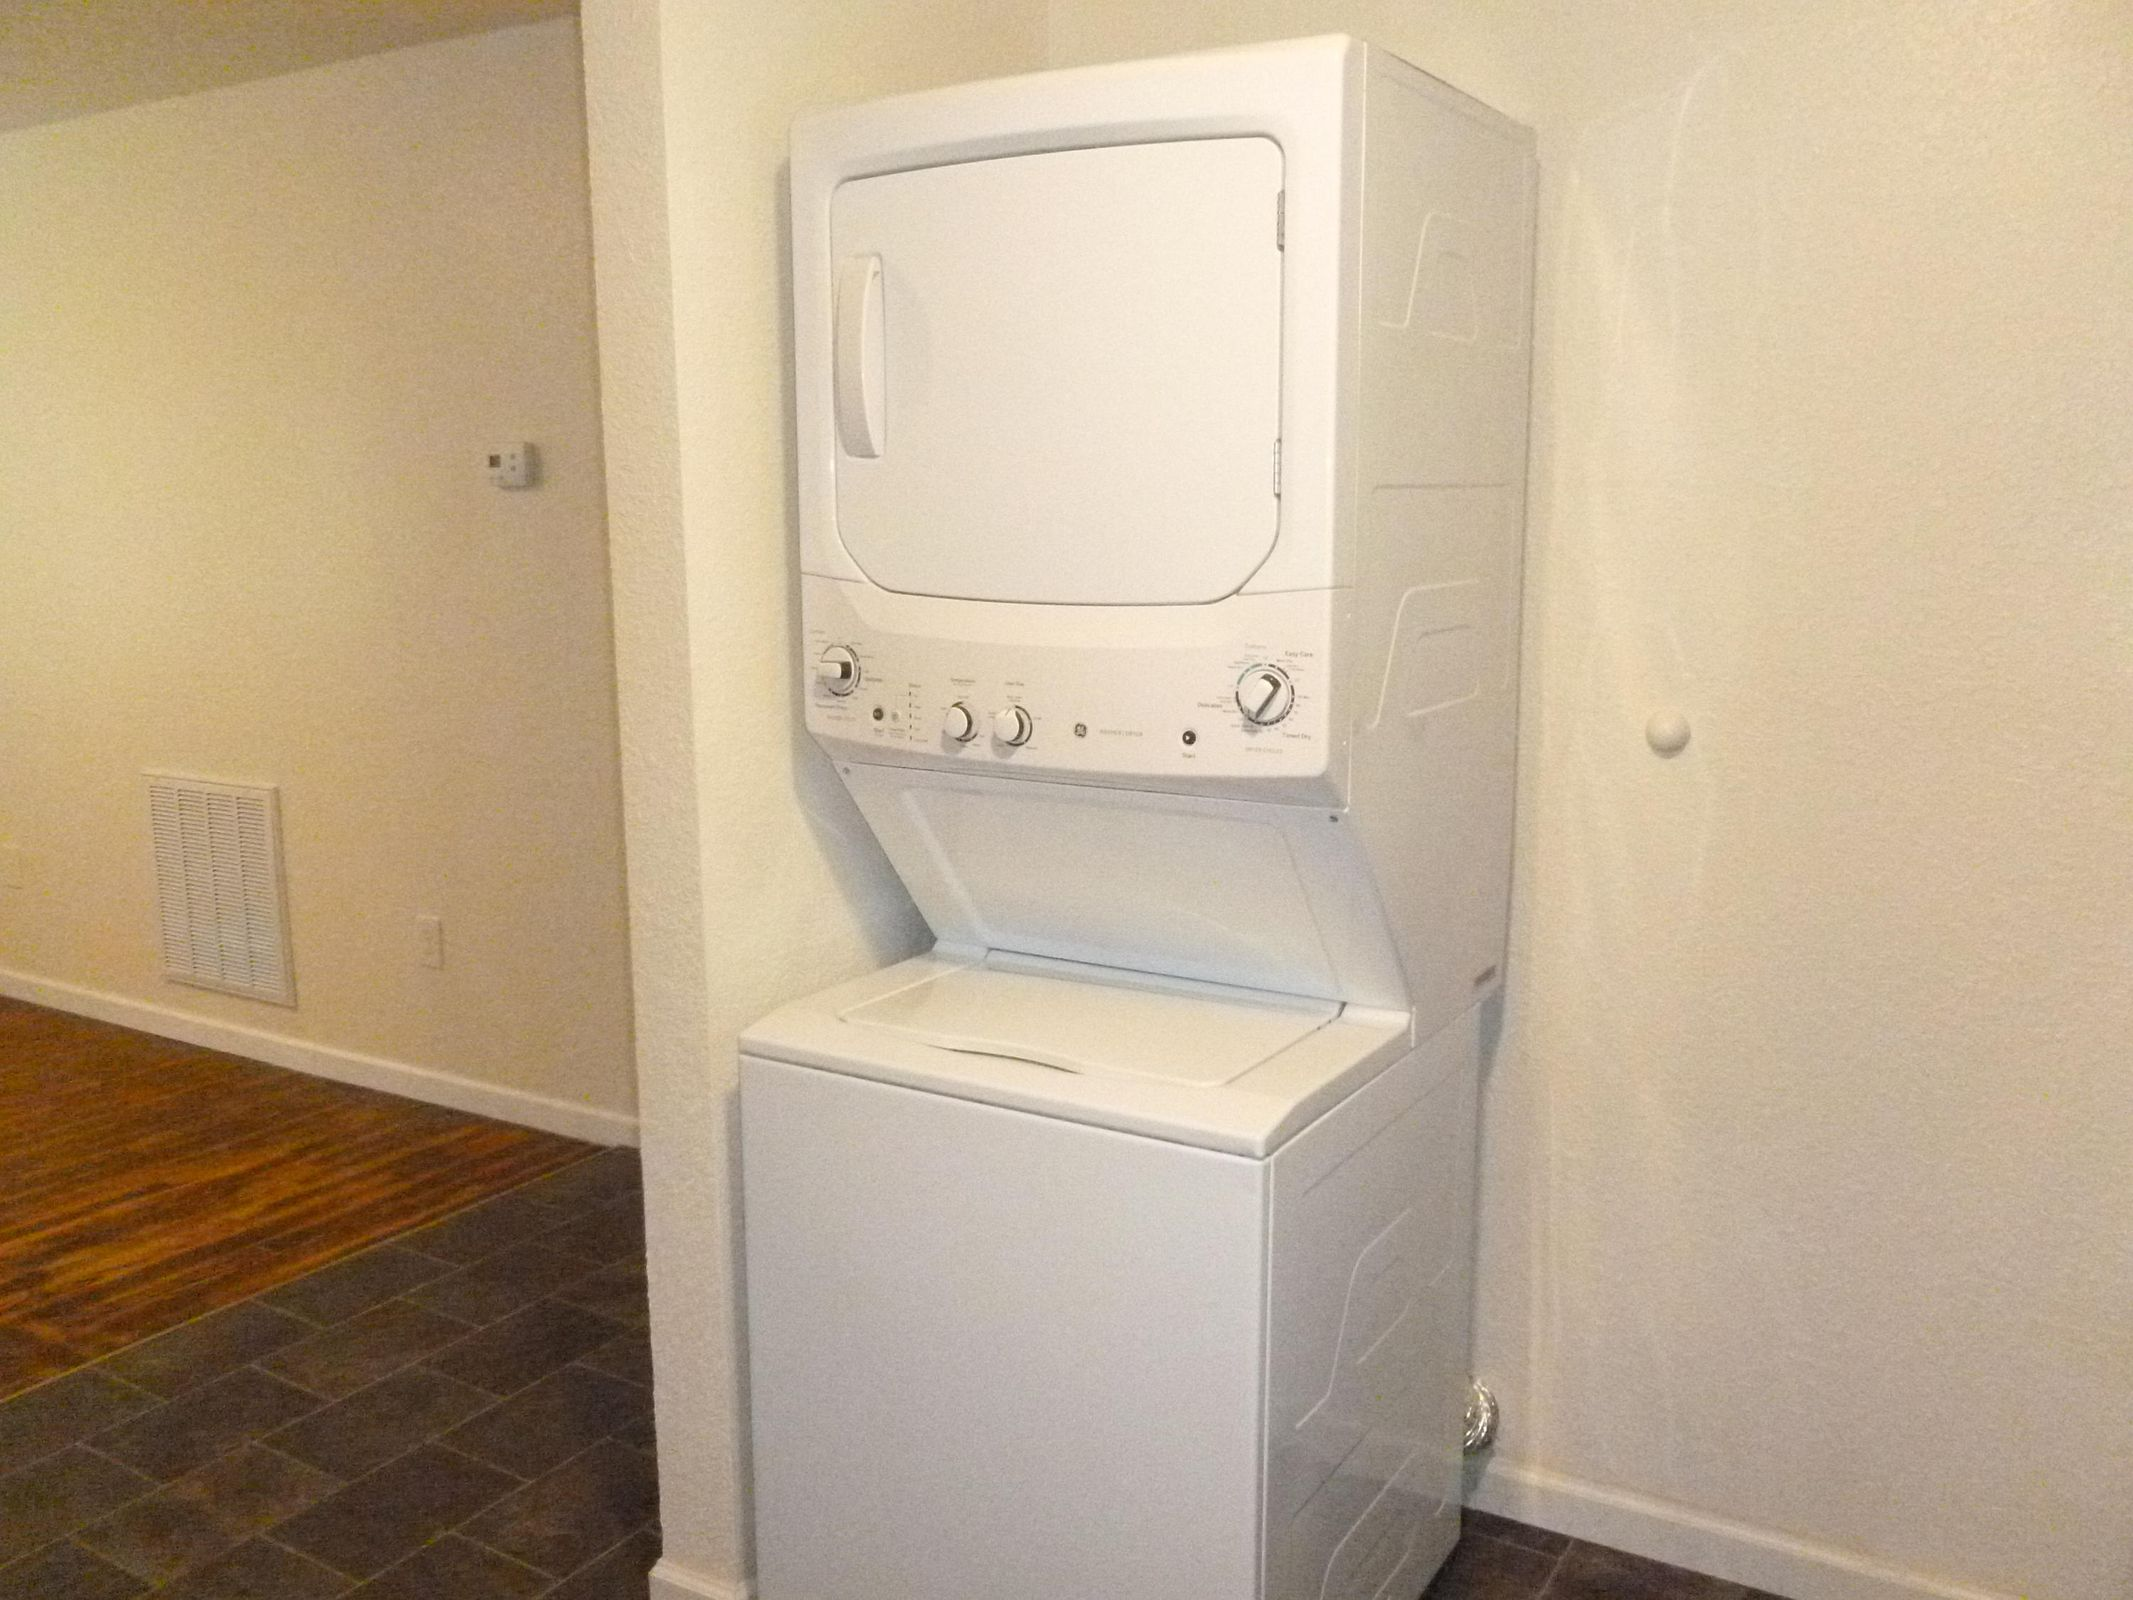 Laundry 106